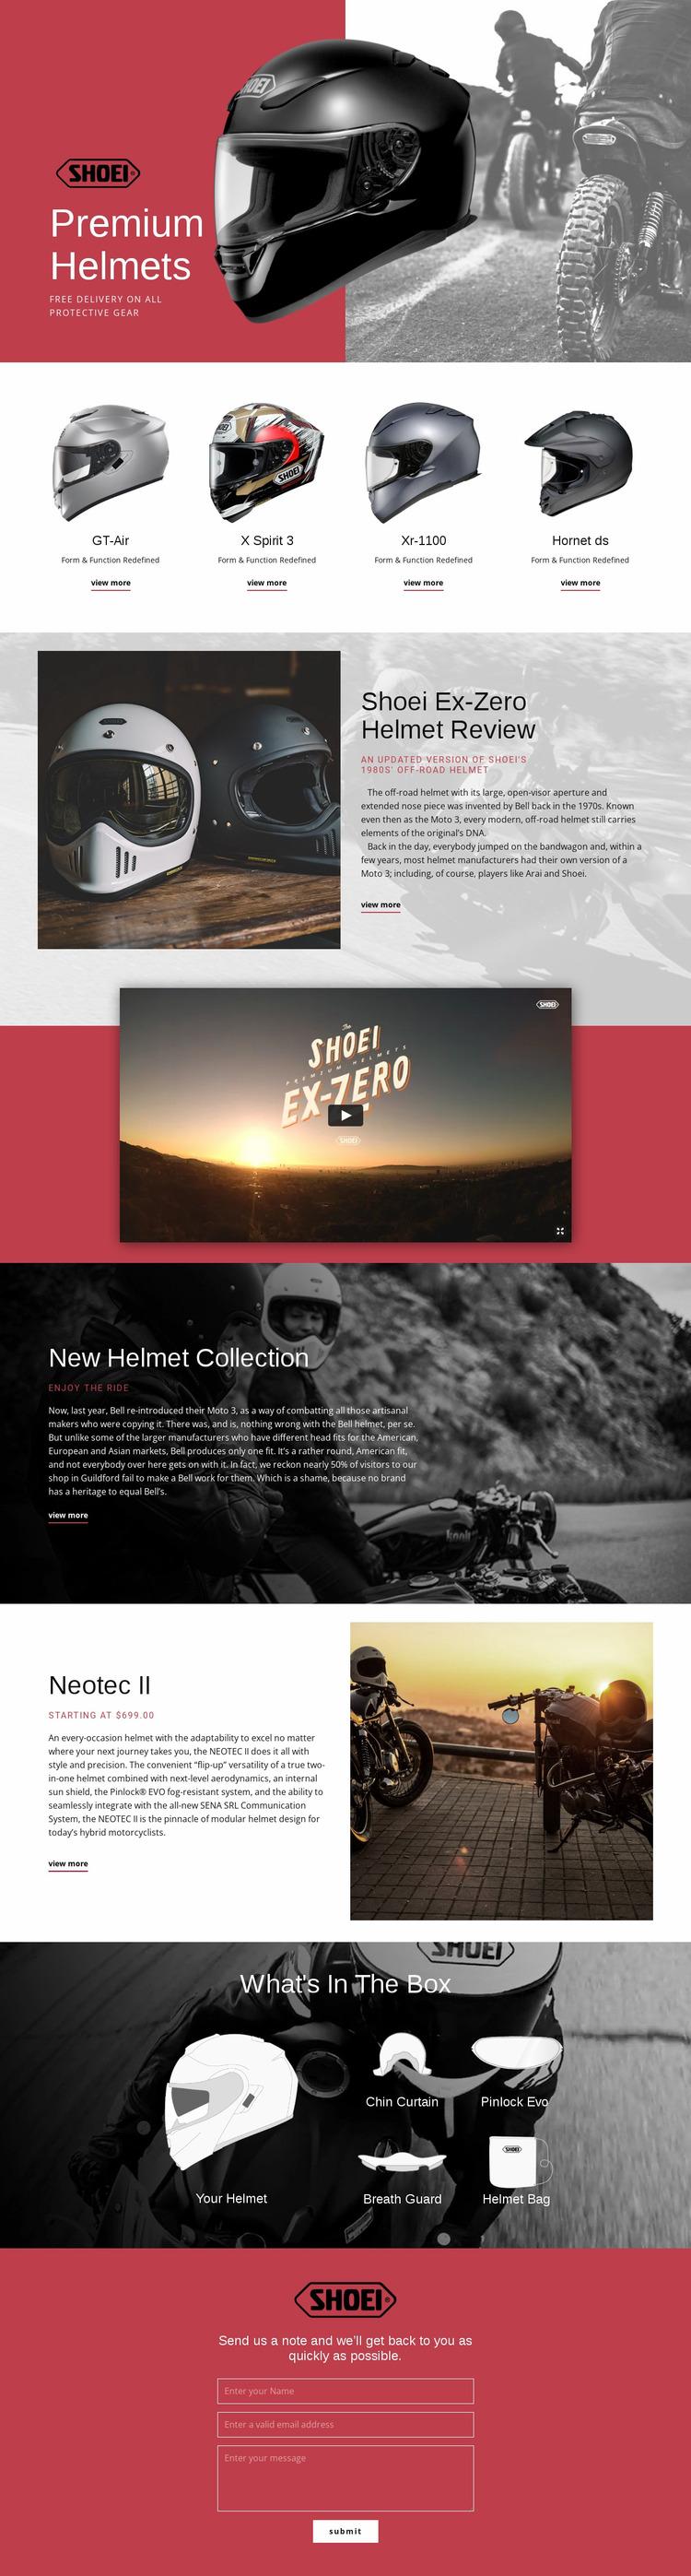 Premium Helmets Website Mockup